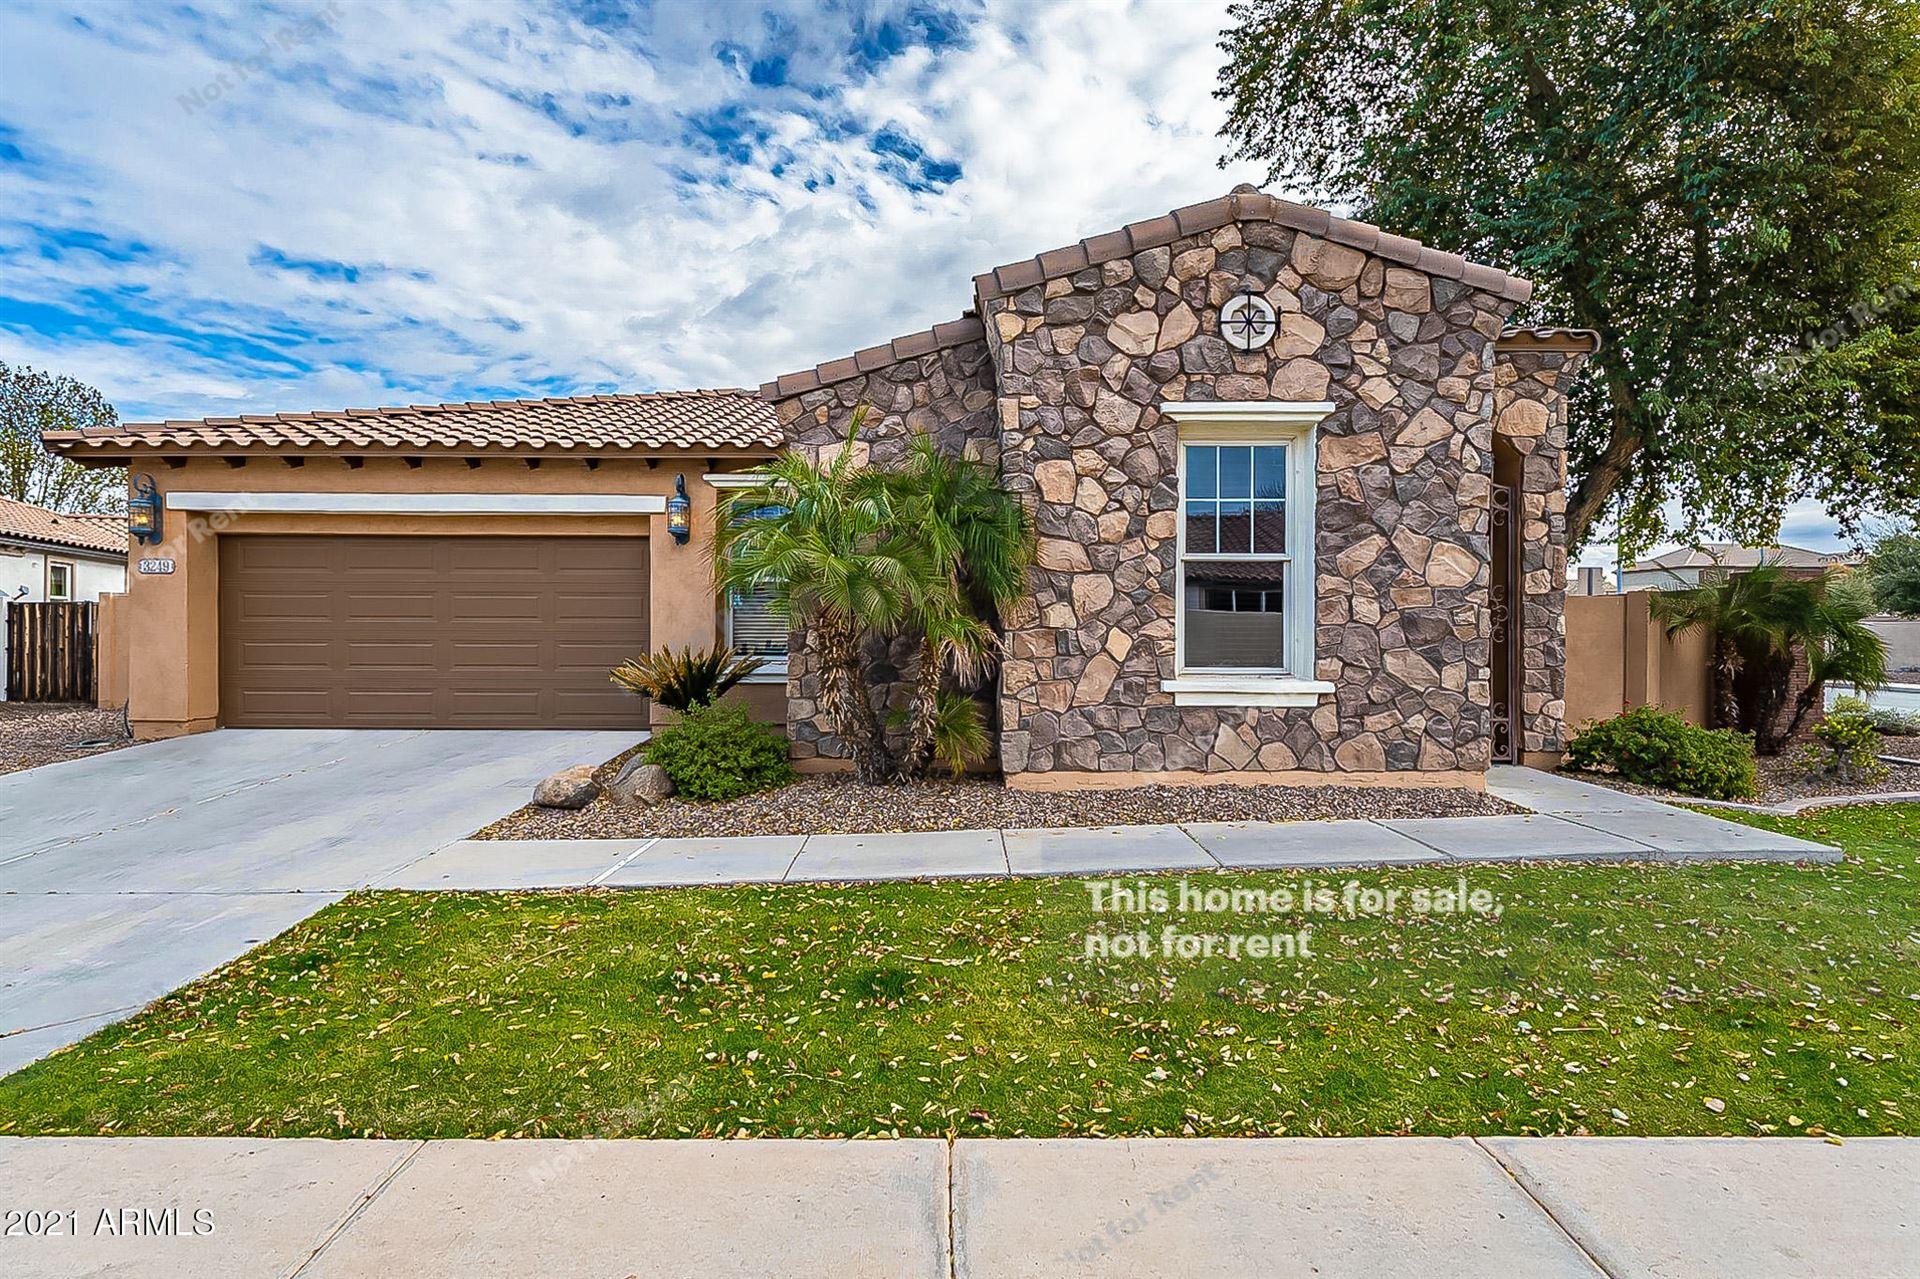 3249 S DANIELSON Way, Chandler, AZ 85286 - MLS#: 6184336